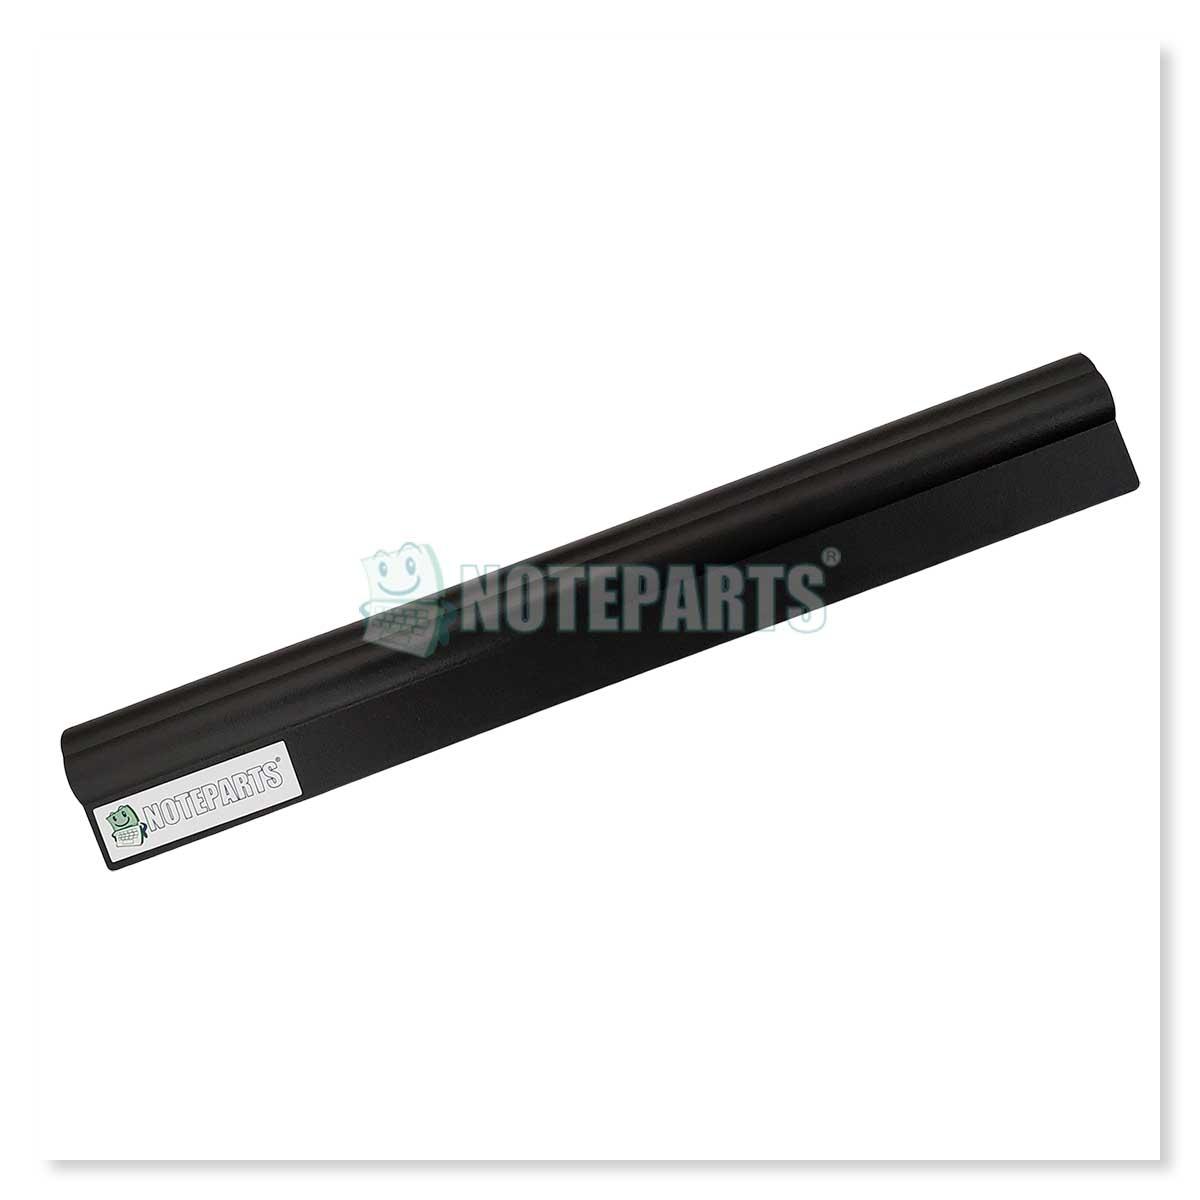 Dell デル Inspiron 3451 3558 5552 Vostro 3459 3559 3568 4セル バッテリー M5Y1K HD4J0対応